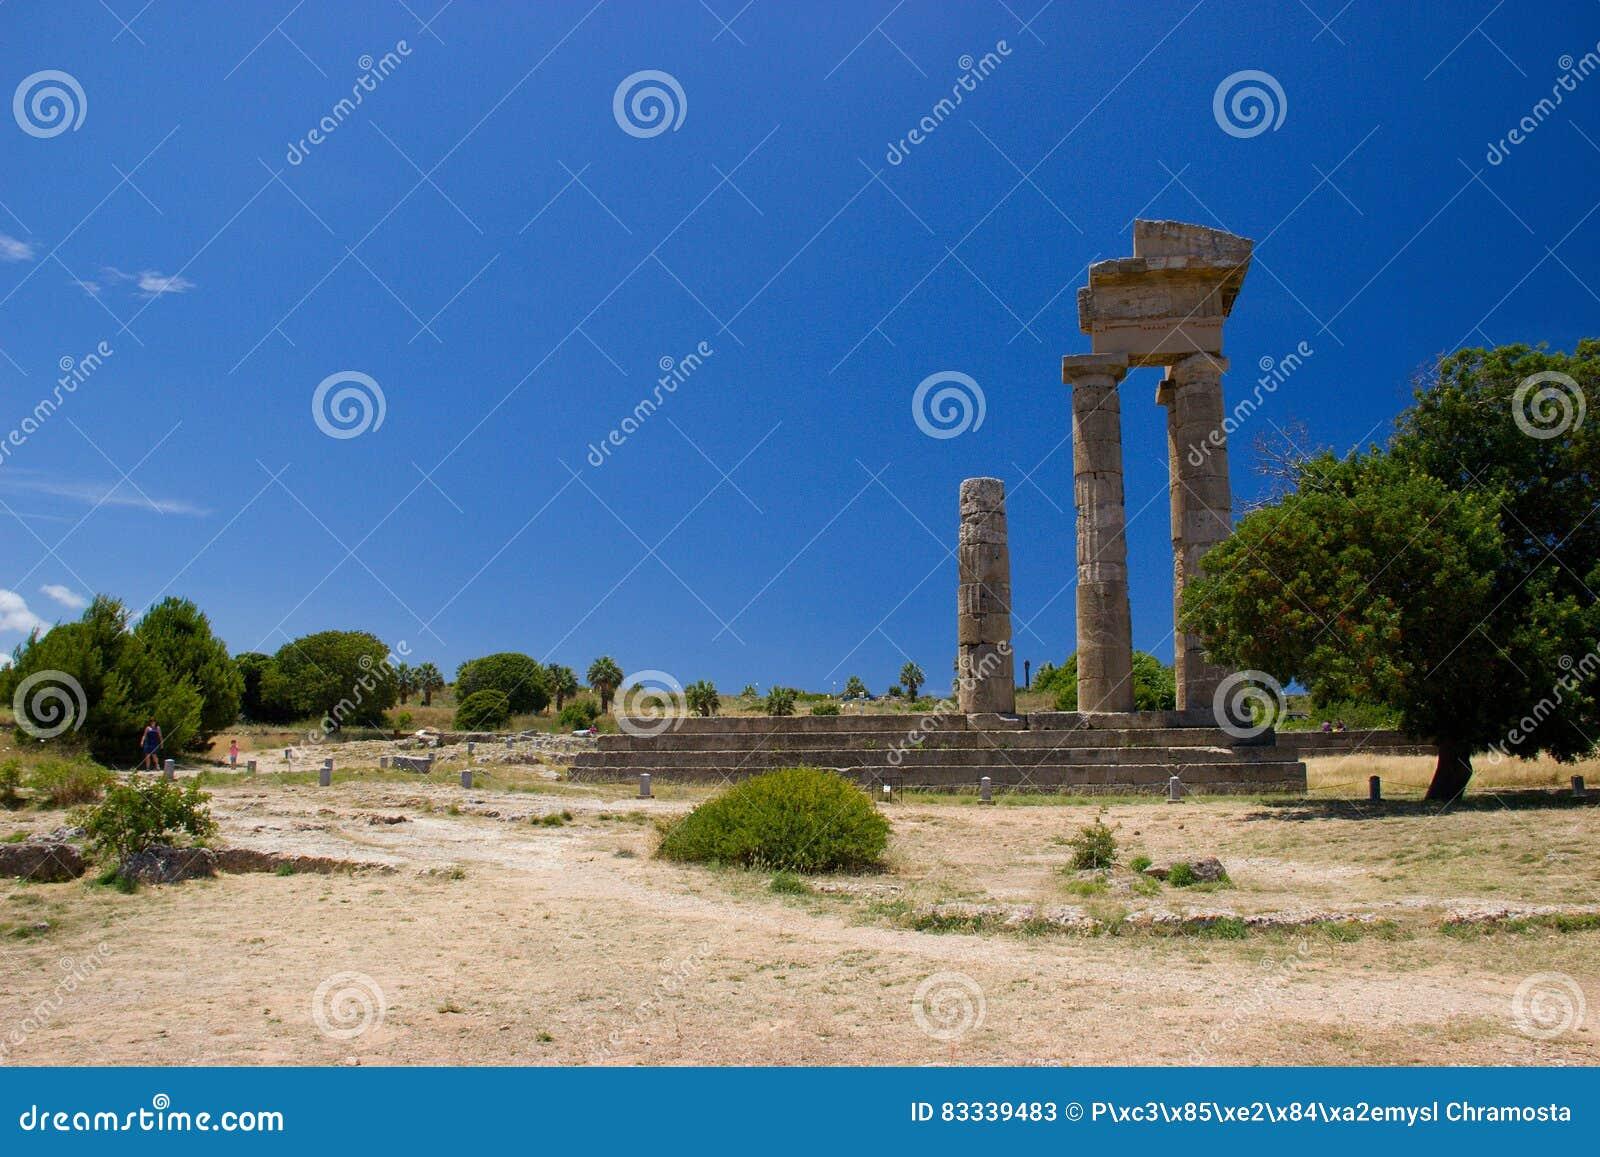 Akropolis of Rhodos historic buildings architecture